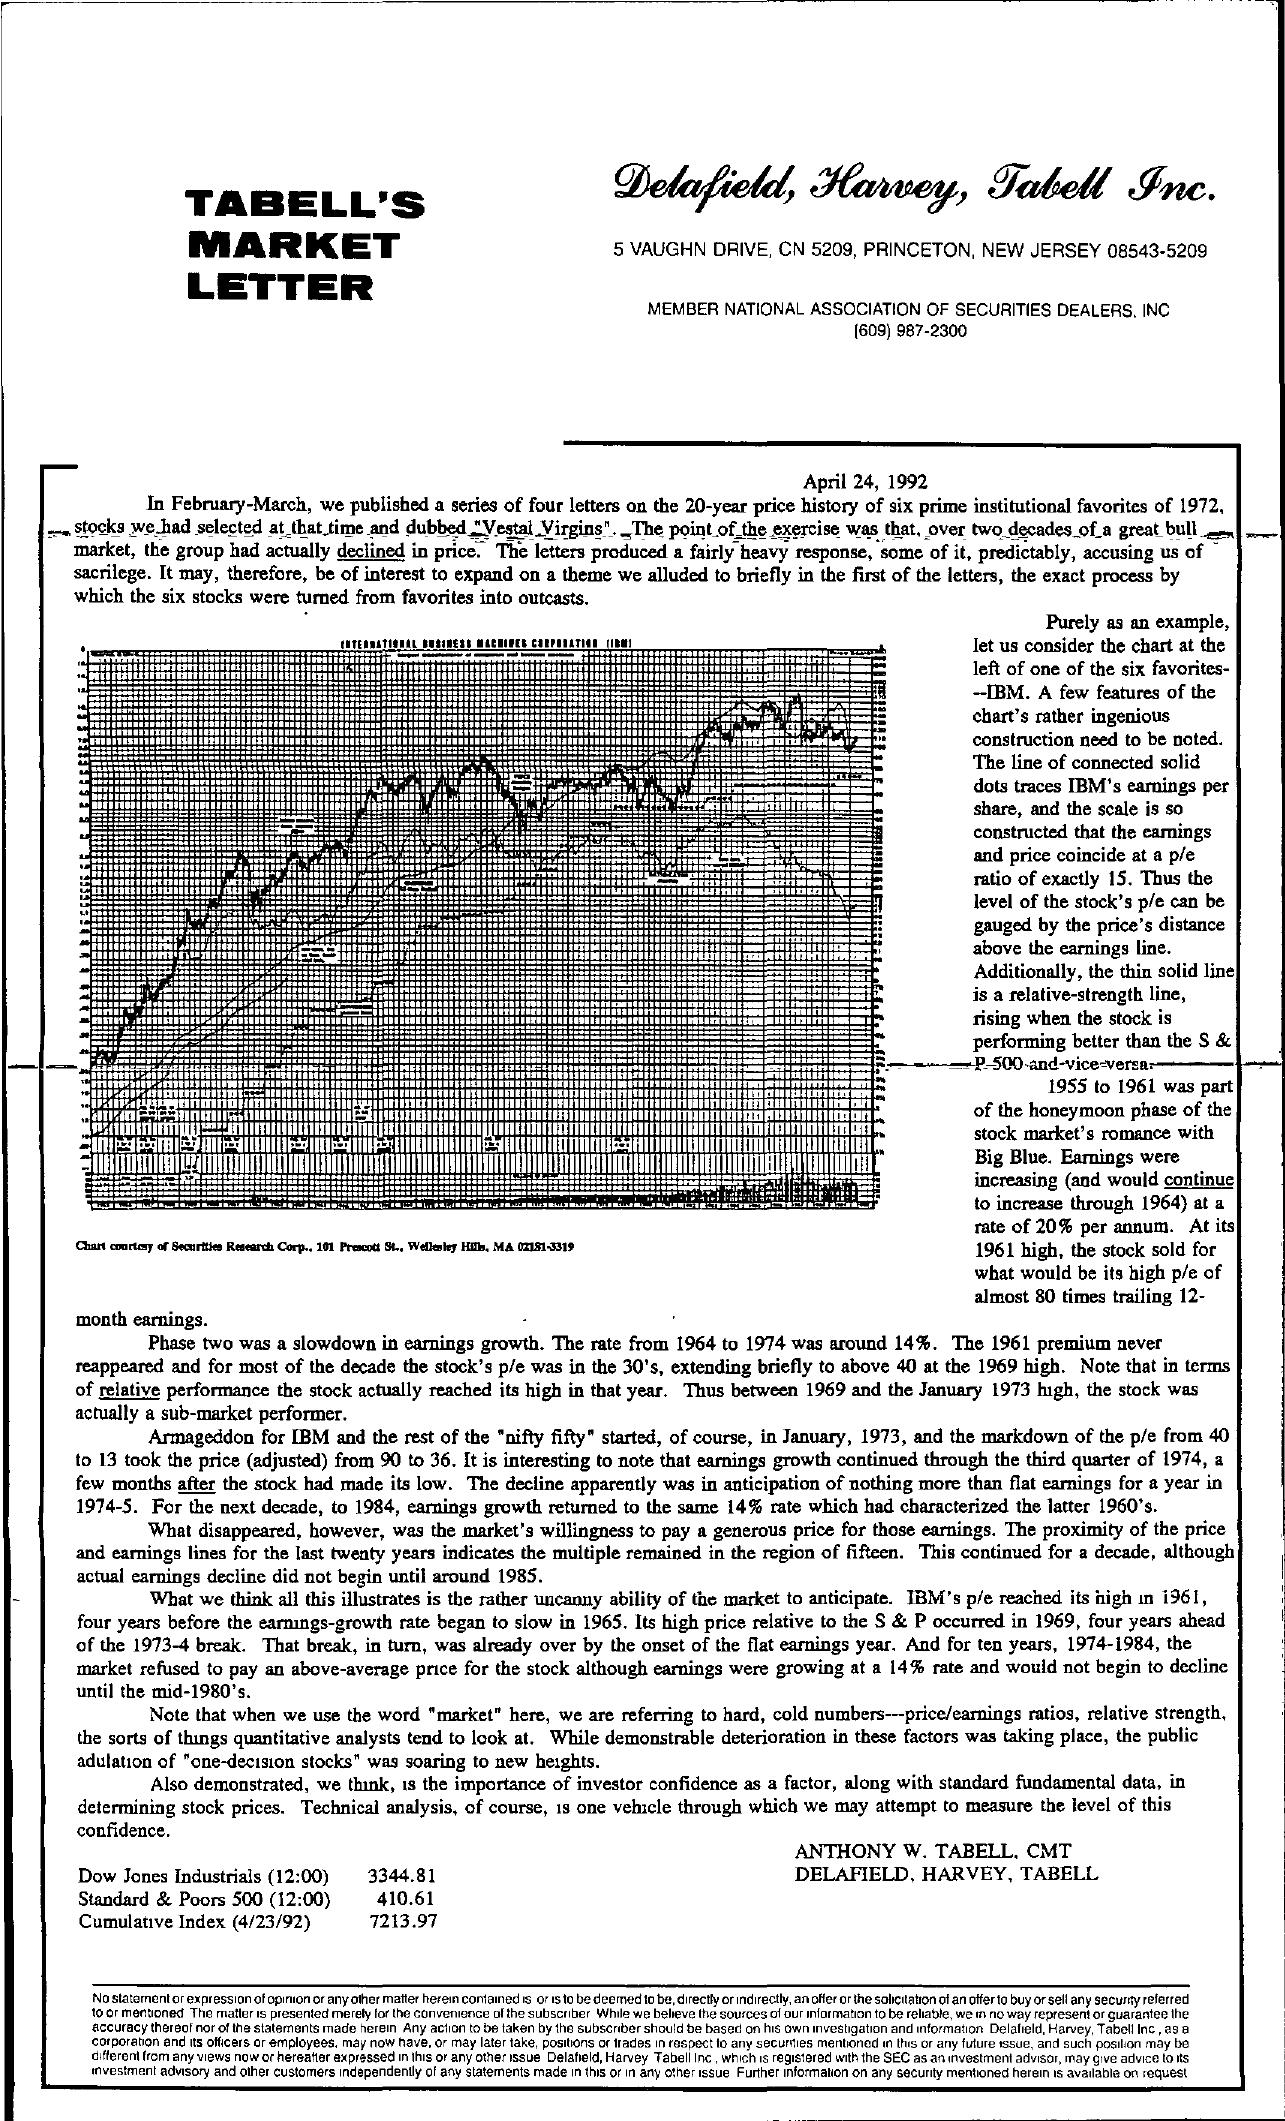 Tabell's Market Letter - April 24, 1992